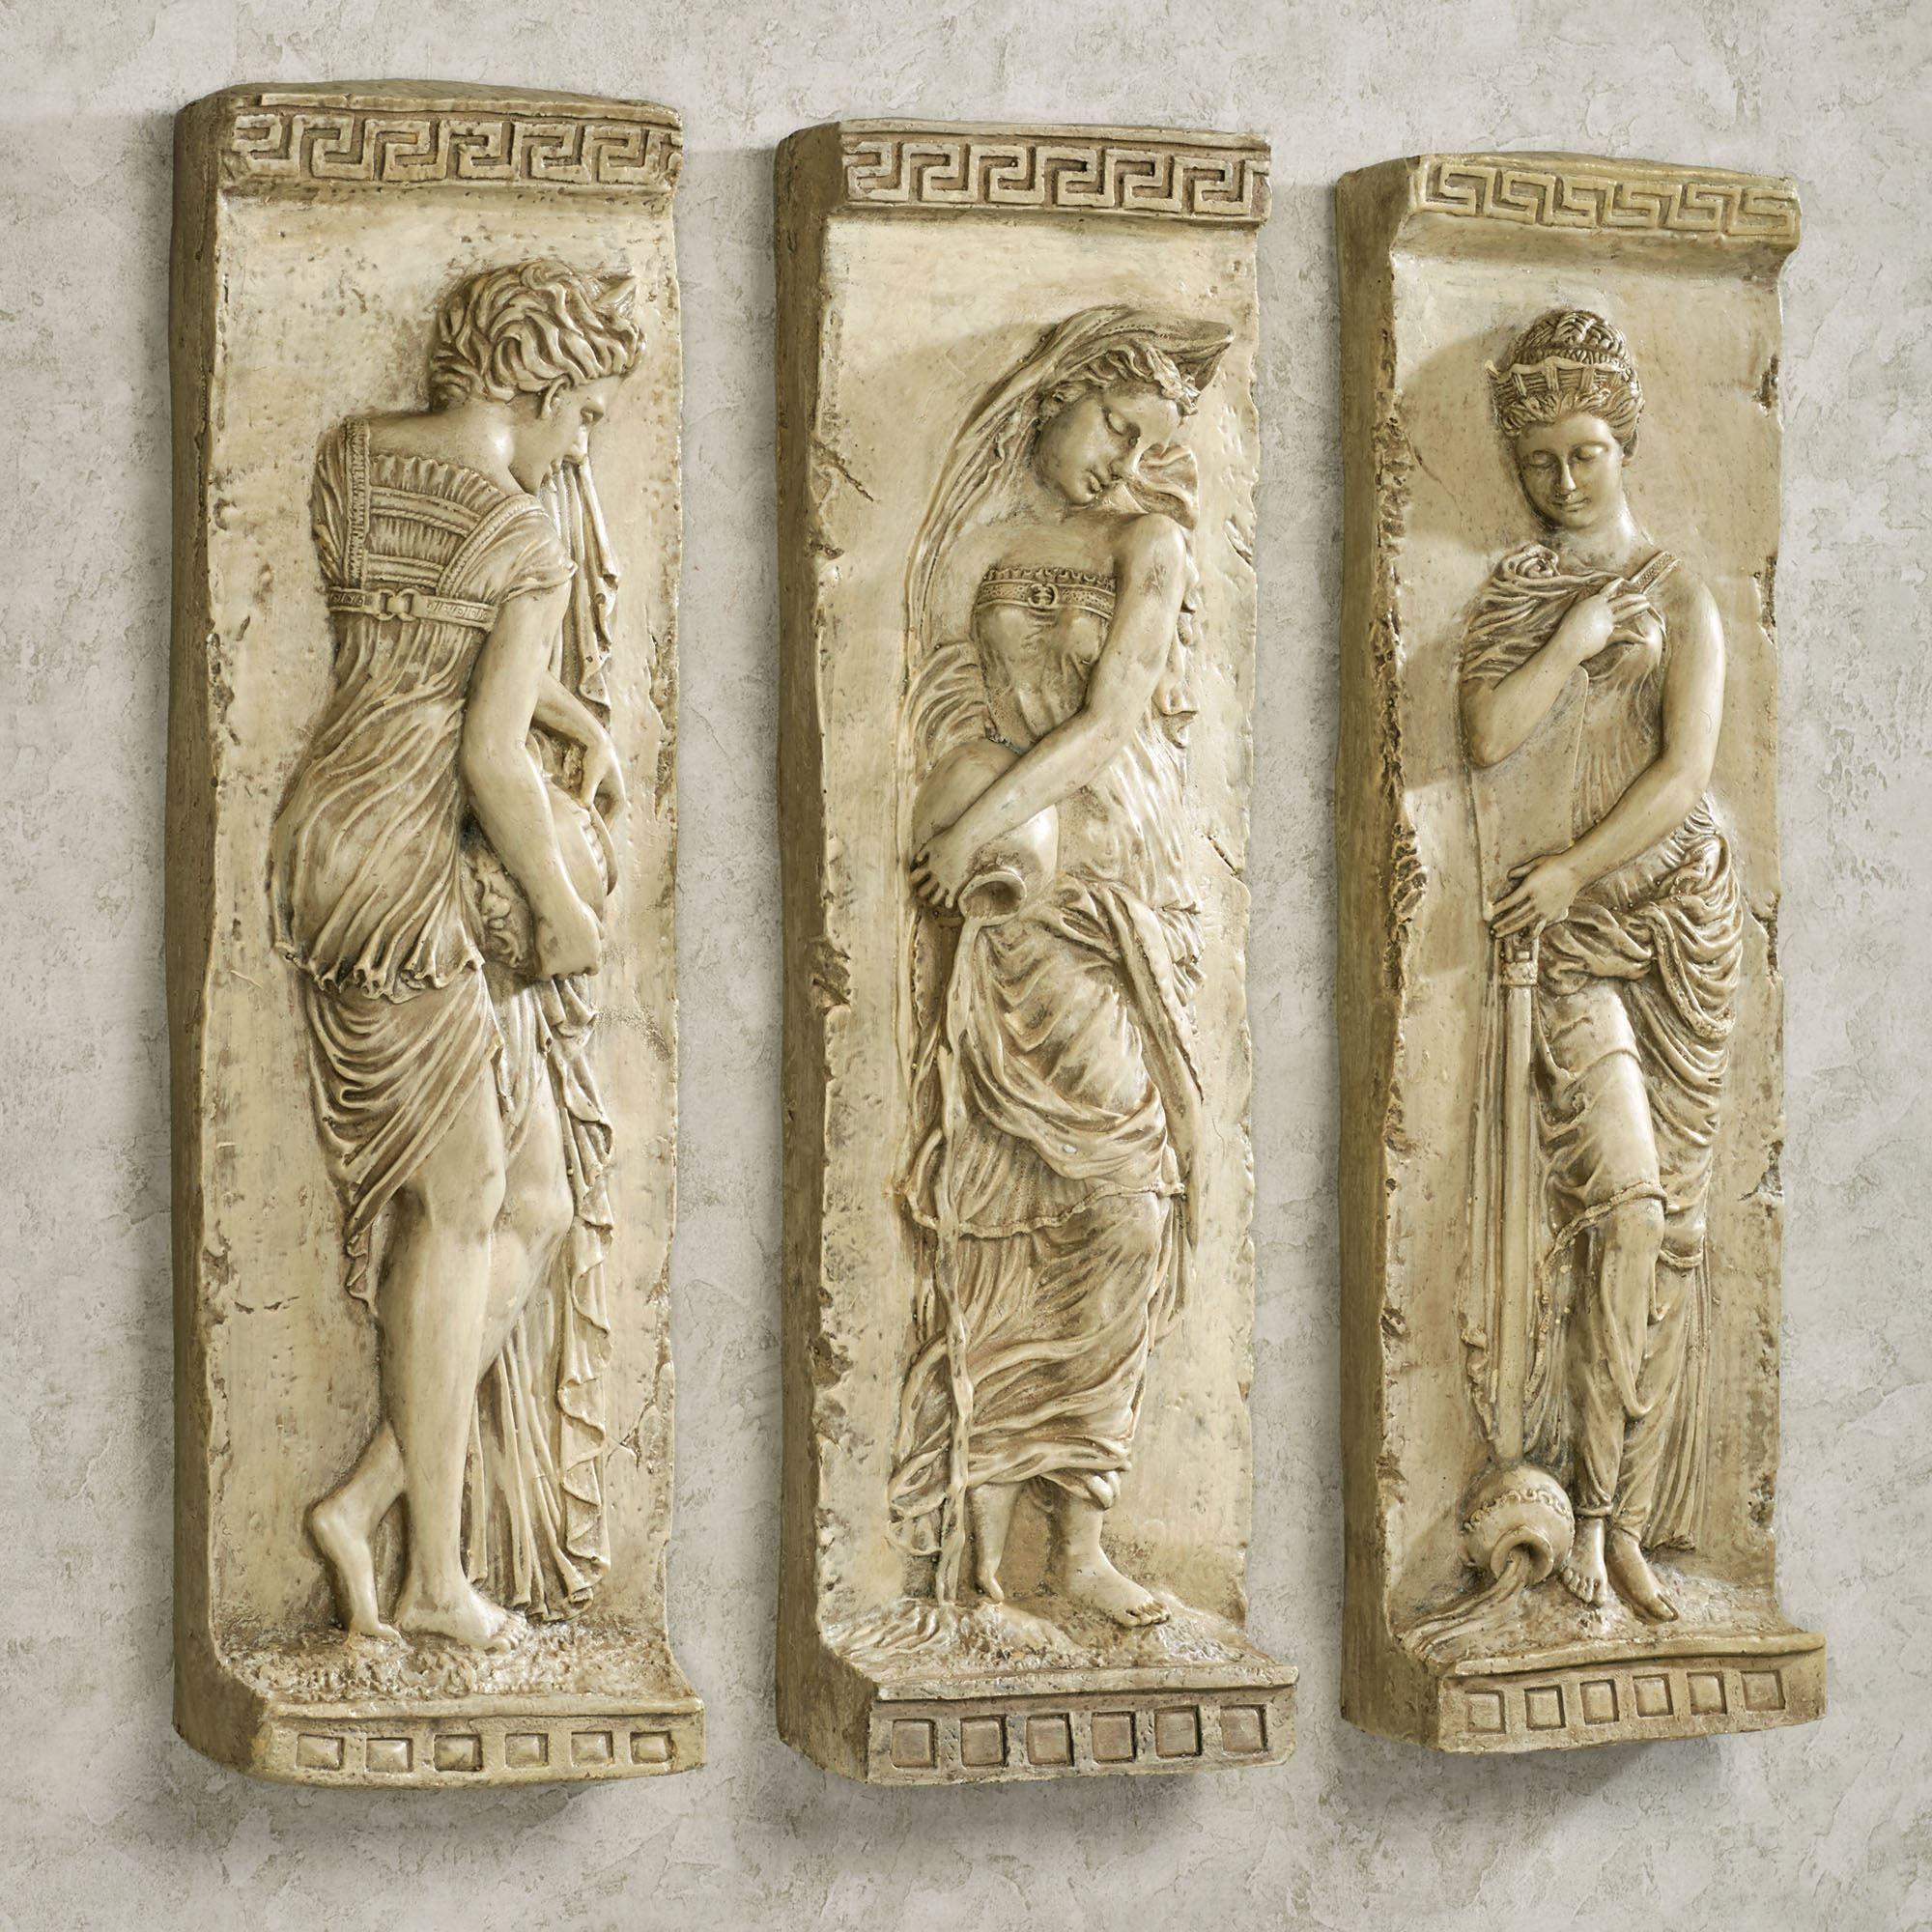 Greek Roman Muse Dancing Wall Plaque Hme Decor